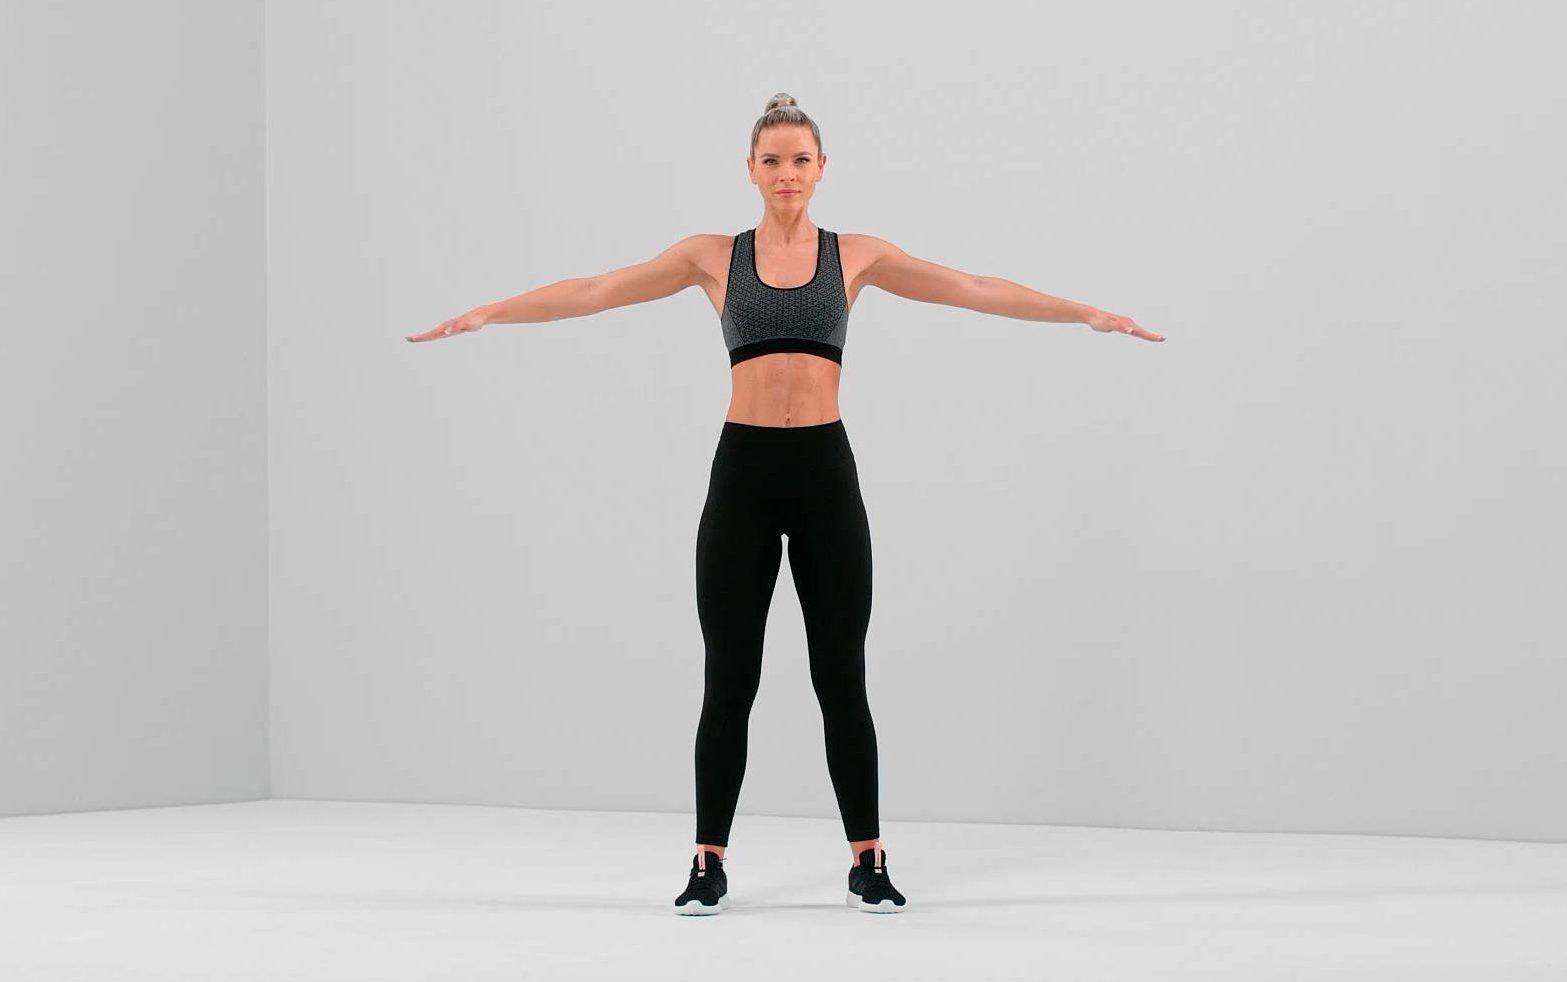 arm circle exercise